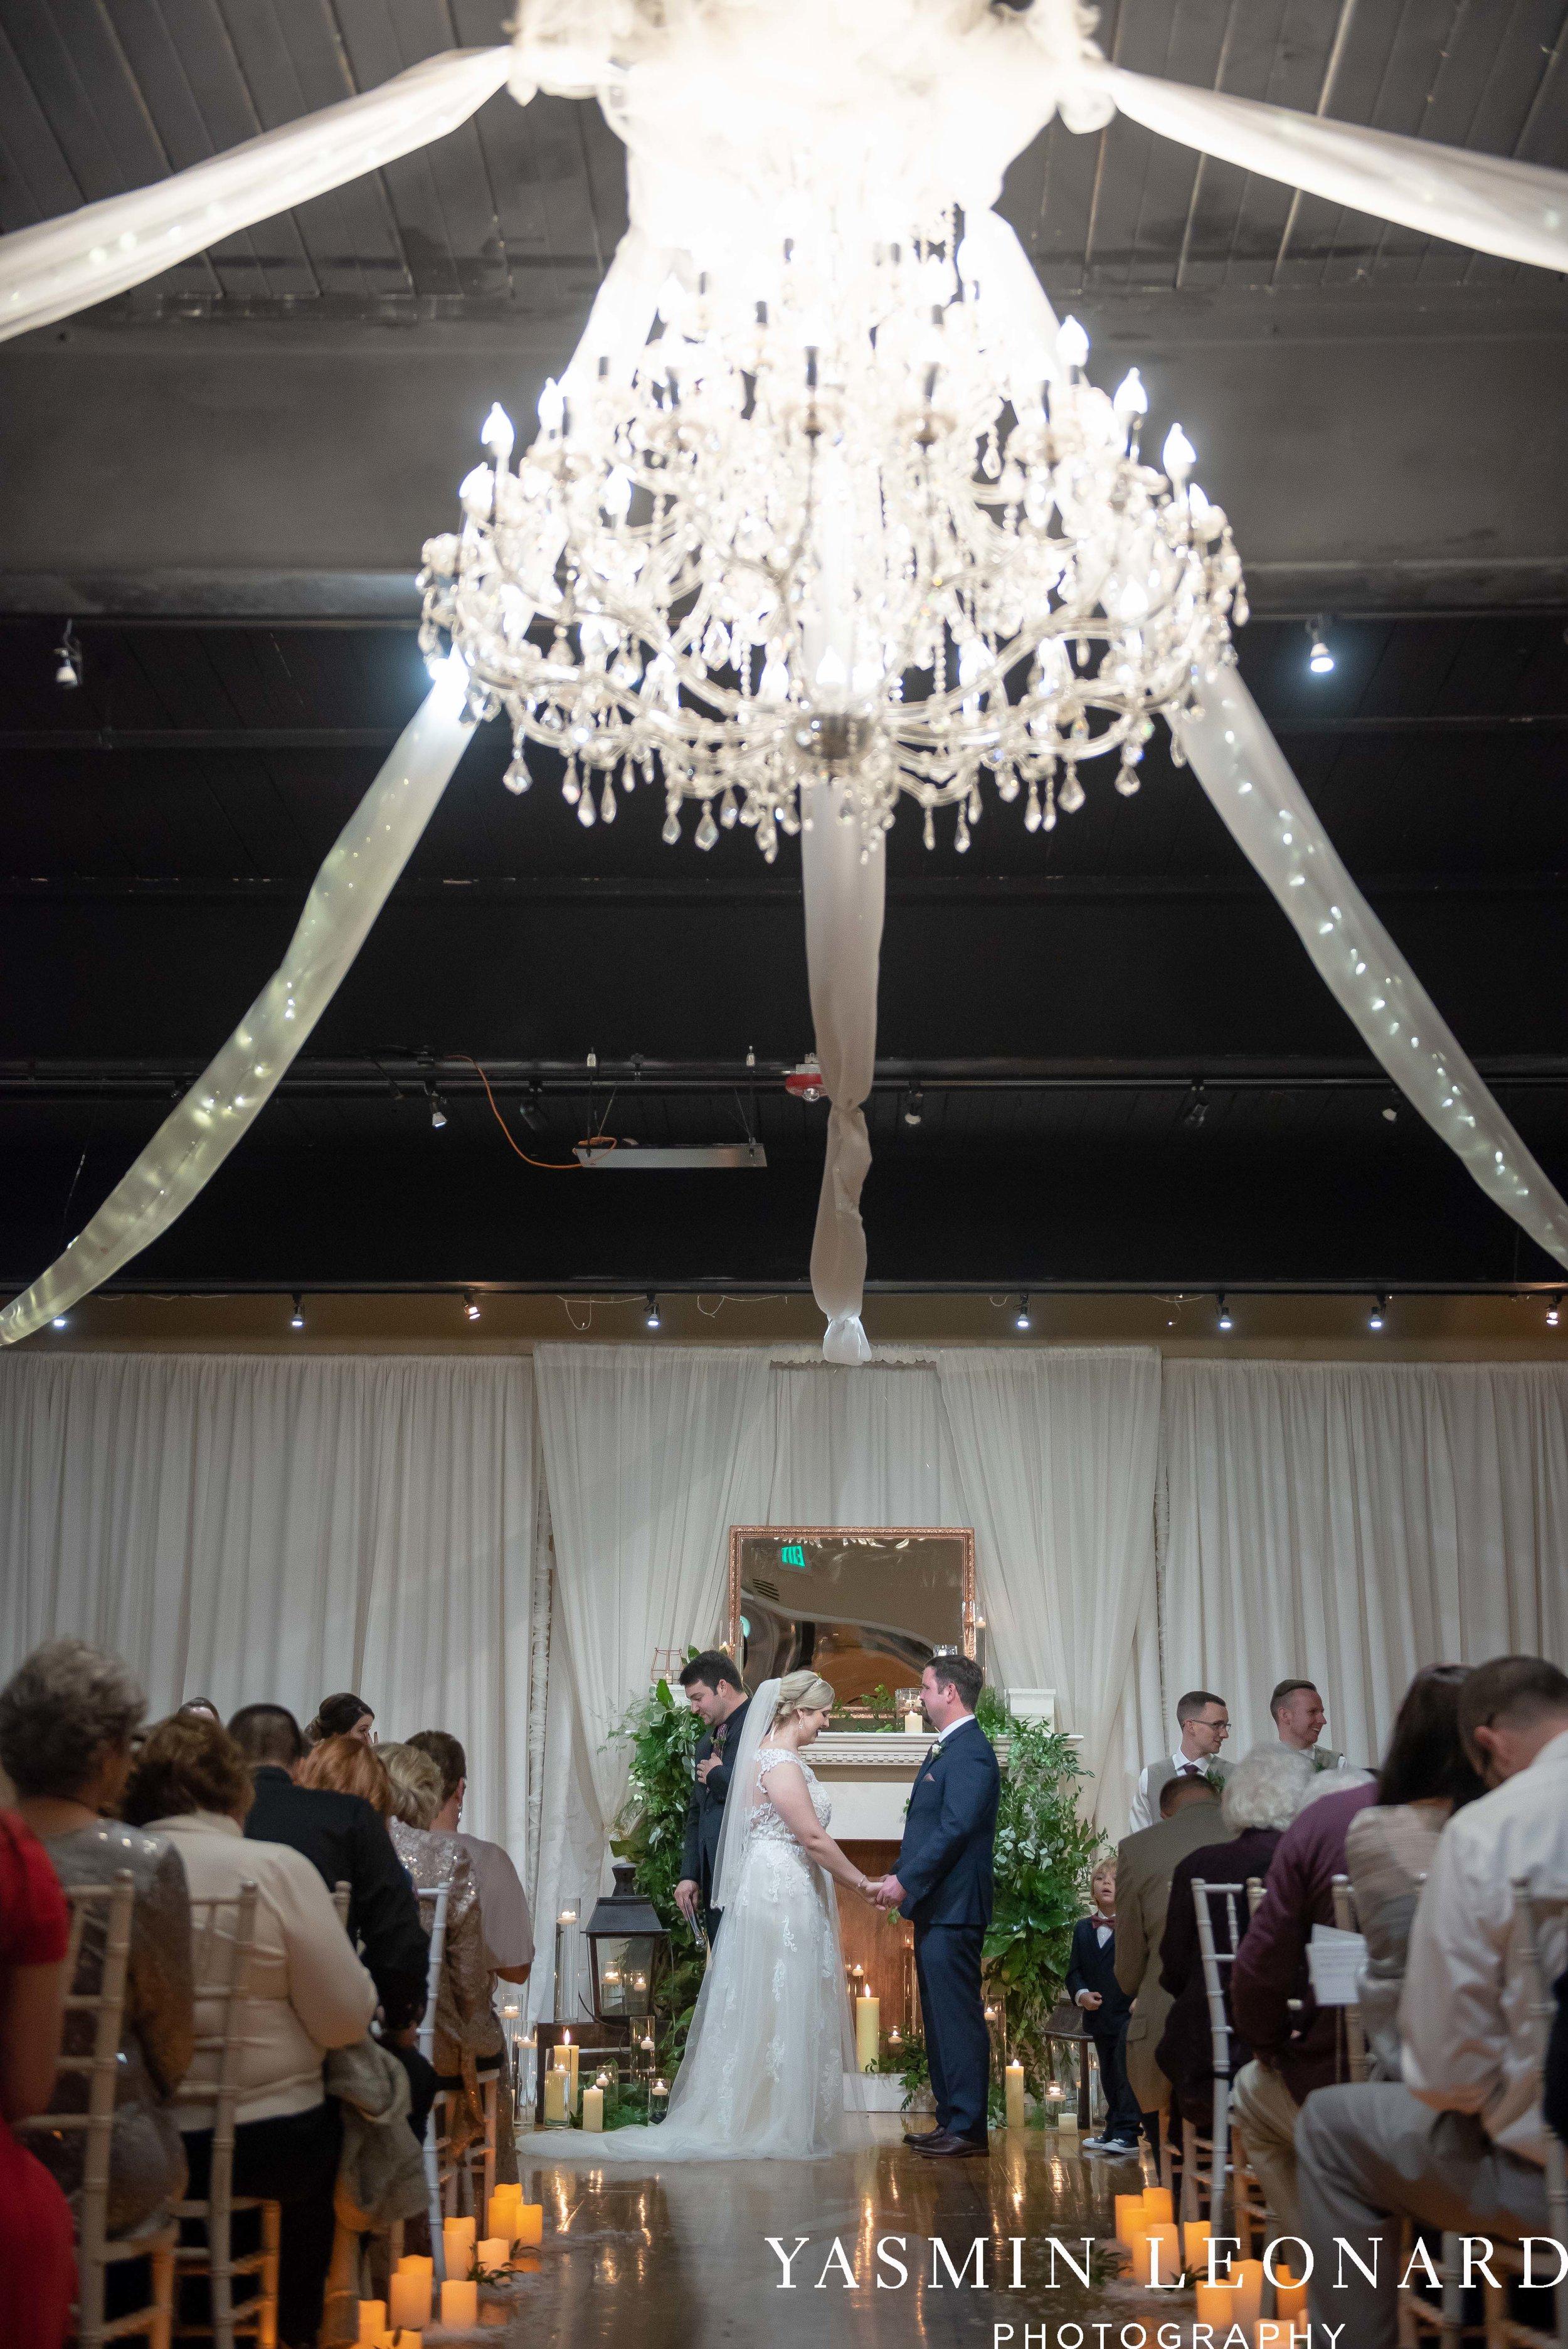 Rebekah and Matt - 105 Worth Event Centre - Yasmin Leonard Photography - Asheboro Wedding - NC Wedding - High Point Weddings - Triad Weddings - Winter Wedding-28.jpg